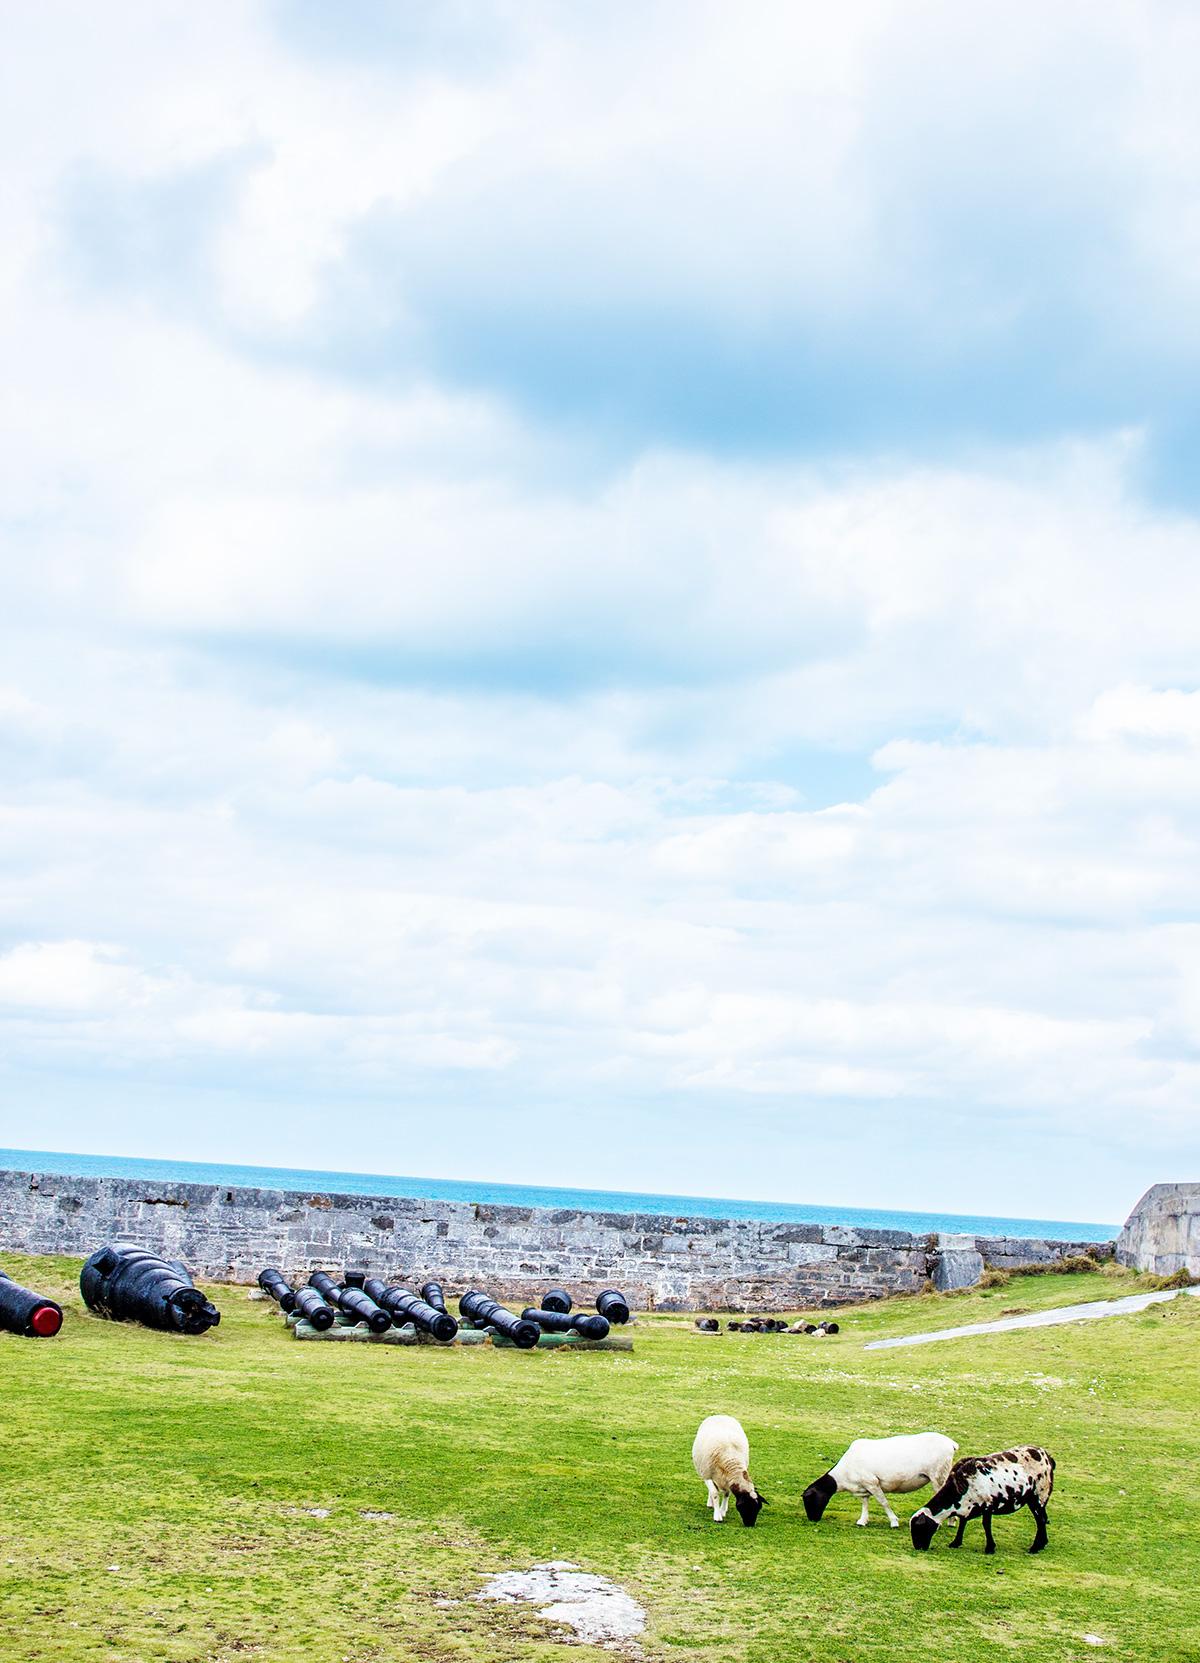 Sheep-Grazing-At-National-Museum-of-Bermuda